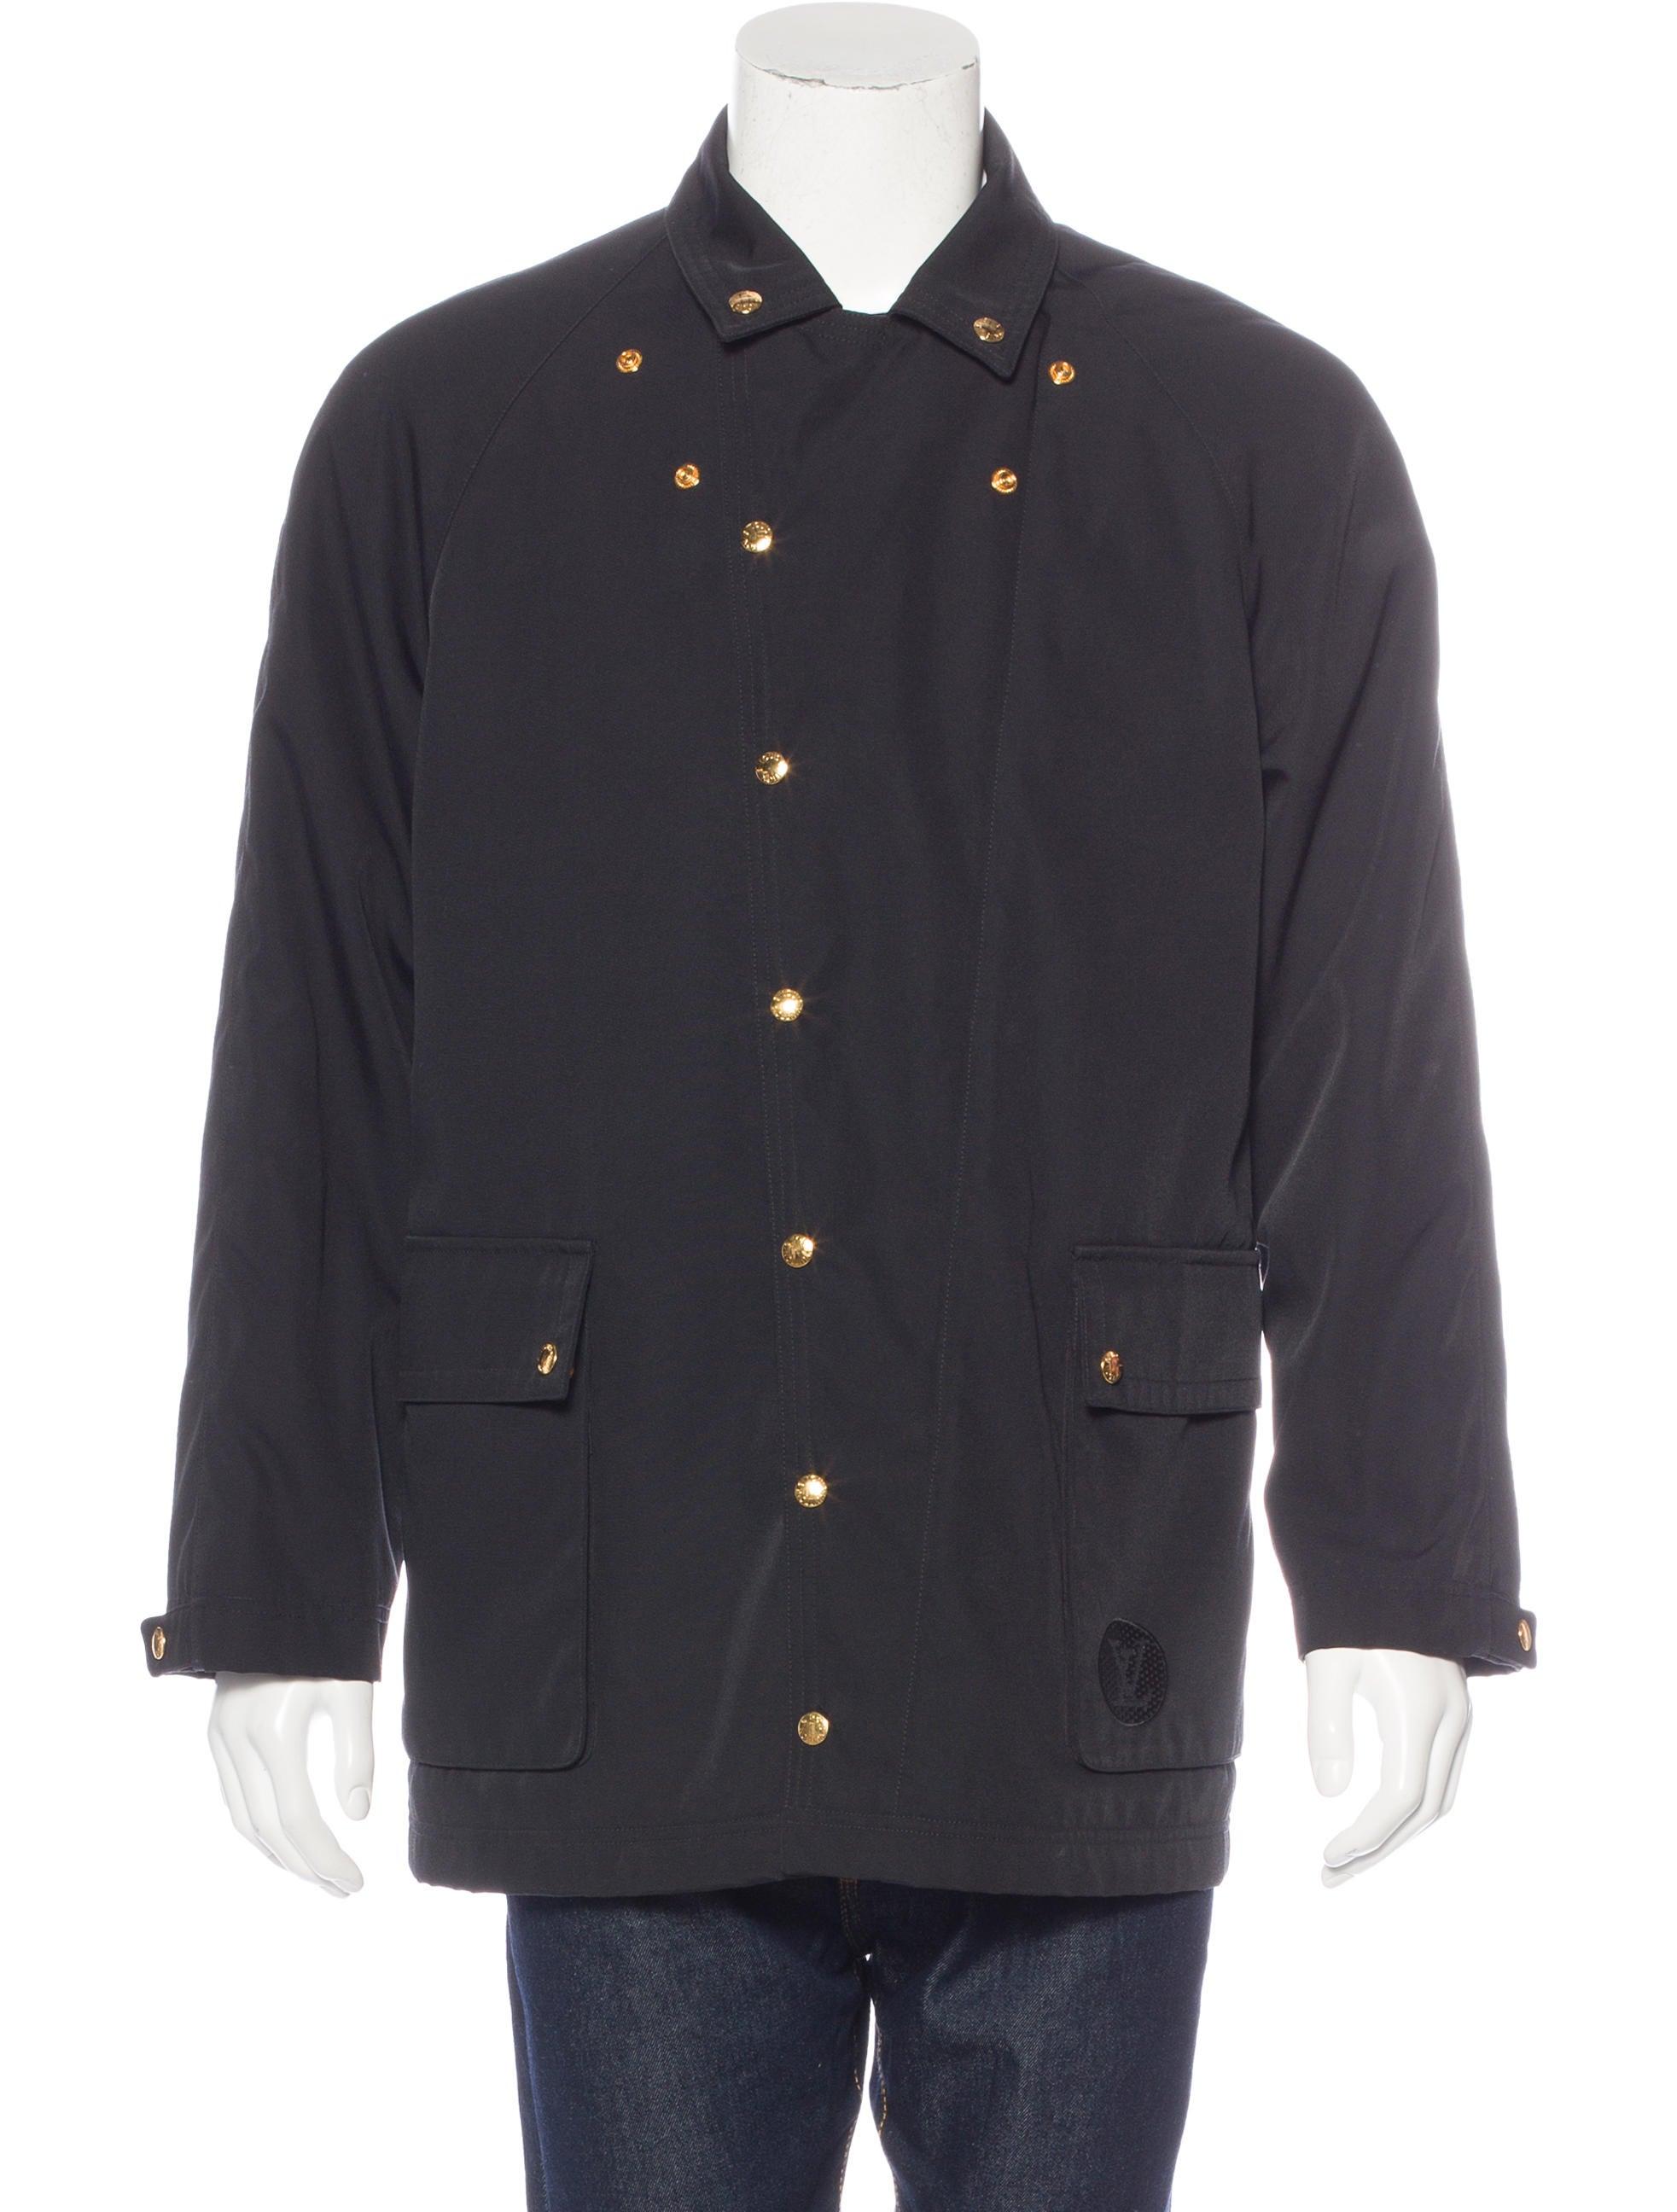 louis vuitton damier lined woven jacket clothing. Black Bedroom Furniture Sets. Home Design Ideas